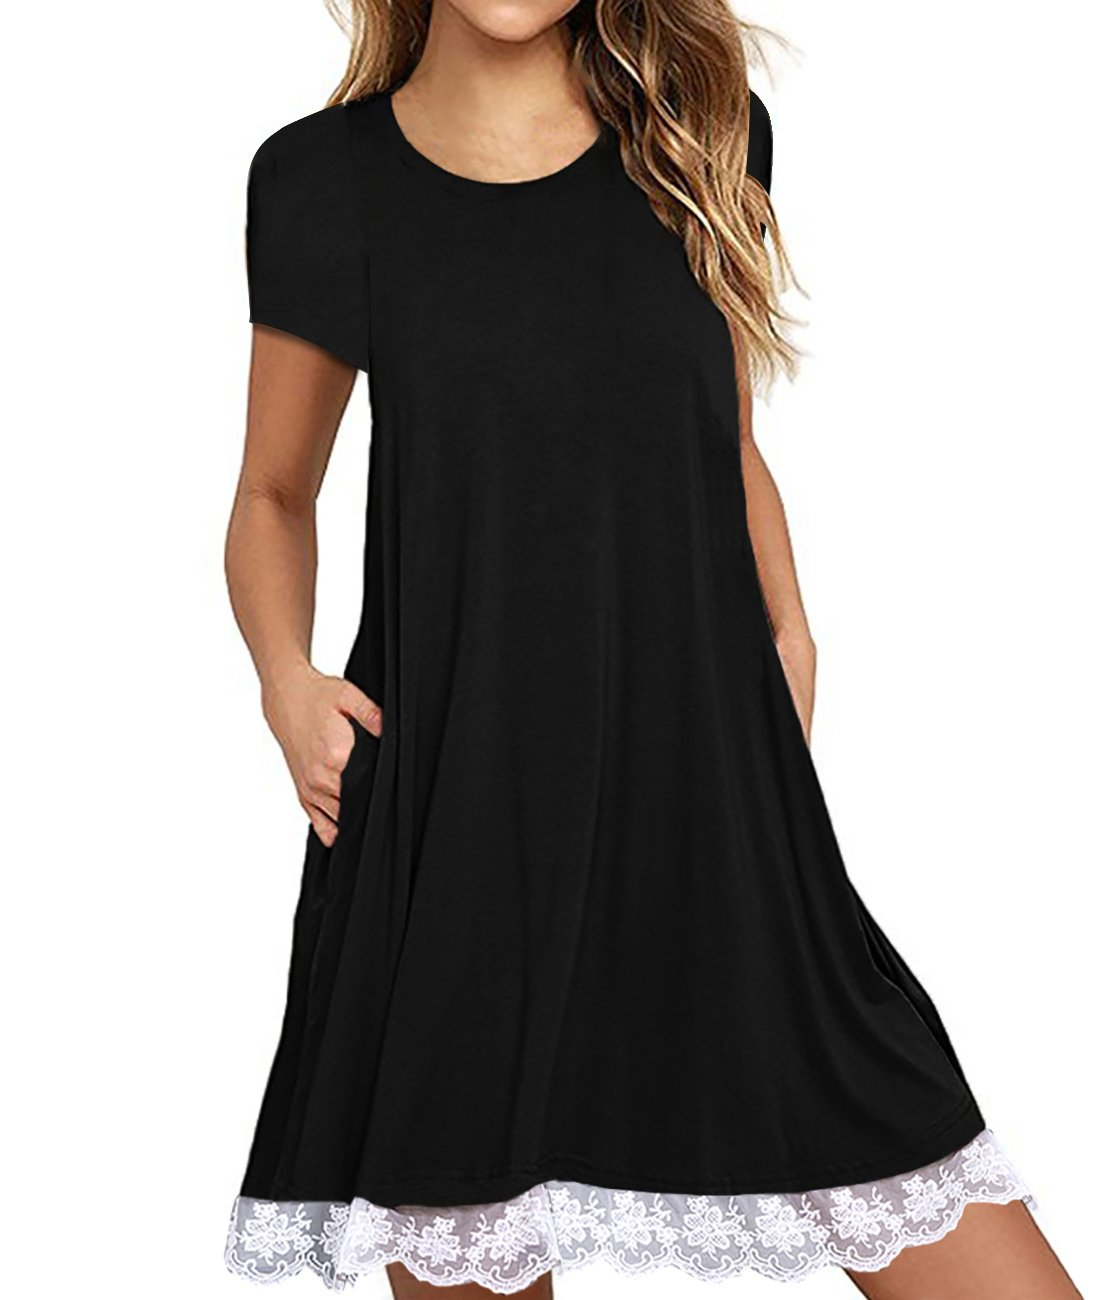 Omerker Women's Short Sleeve Pocket Lace T-Shirt Dress Swing Summer Tunic Dress(Small,Black)